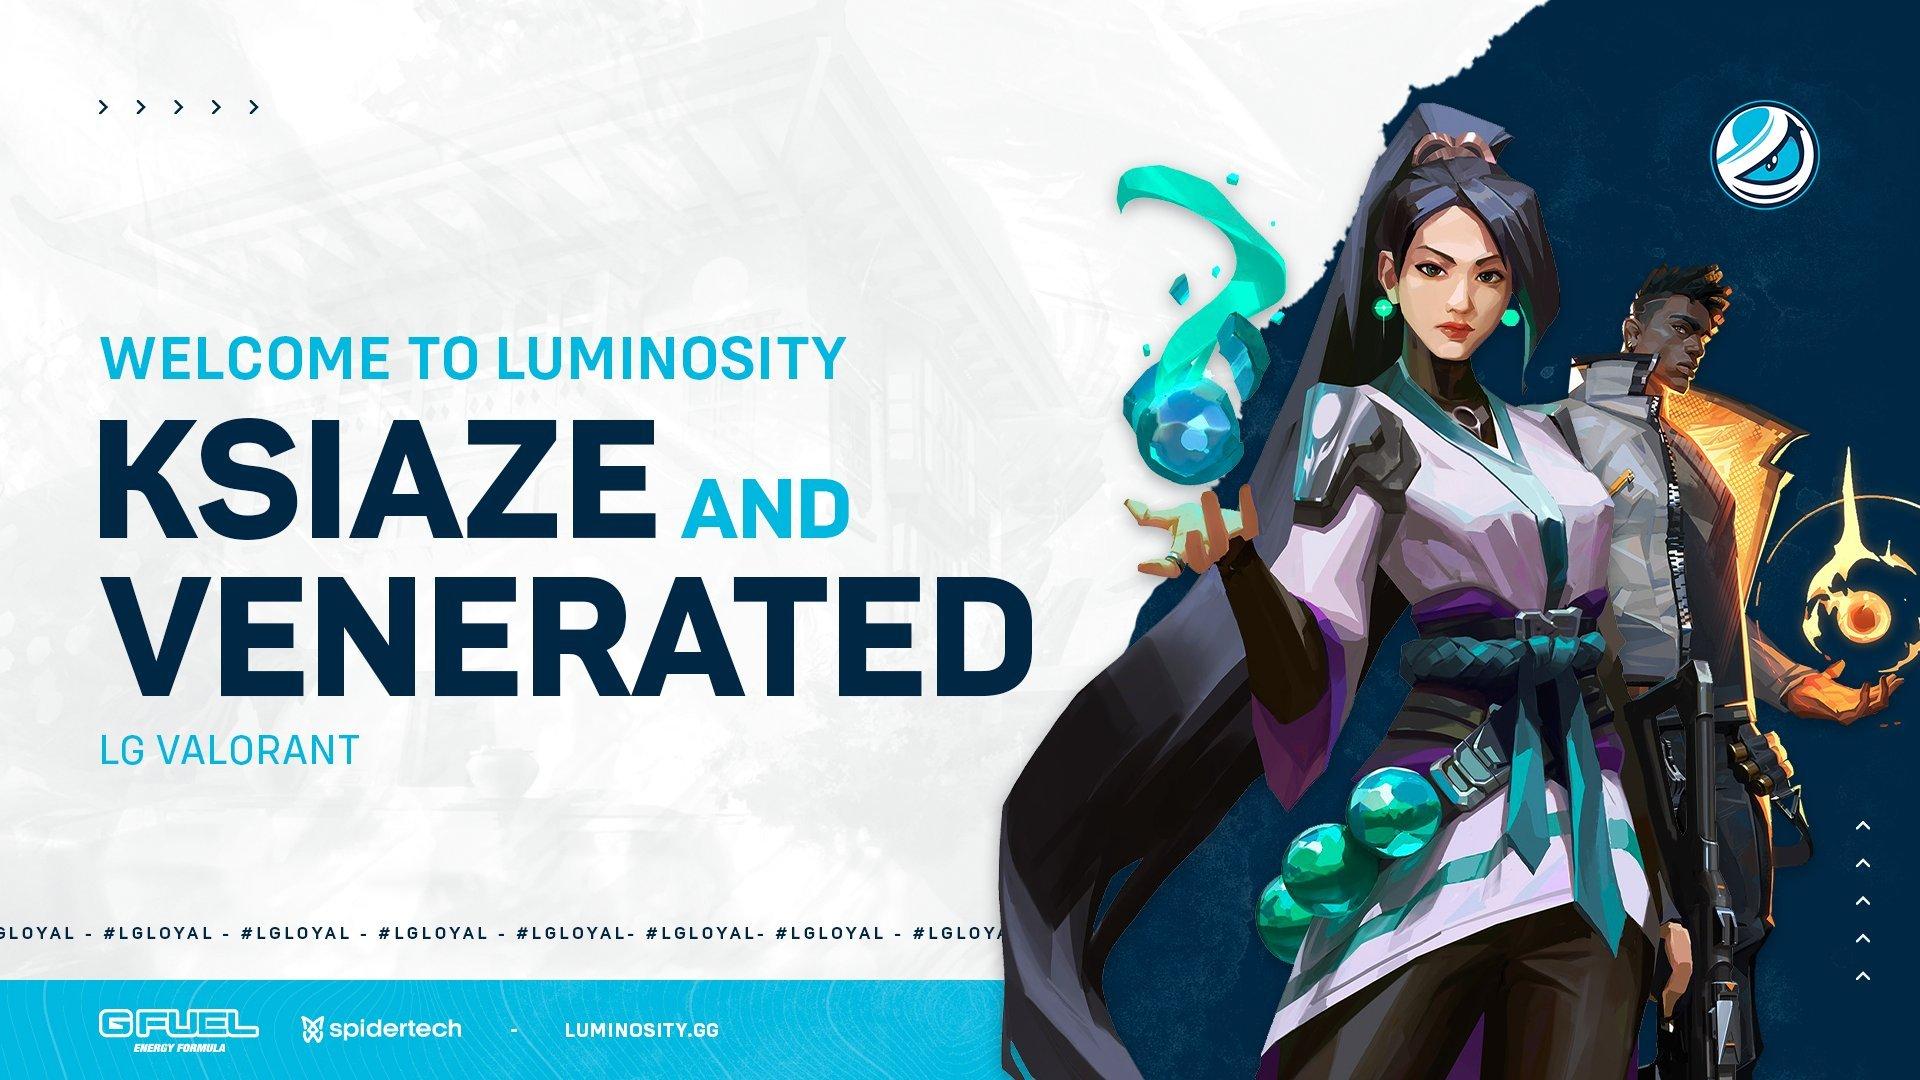 Luminosity welcomes Ksiaze and Venerated